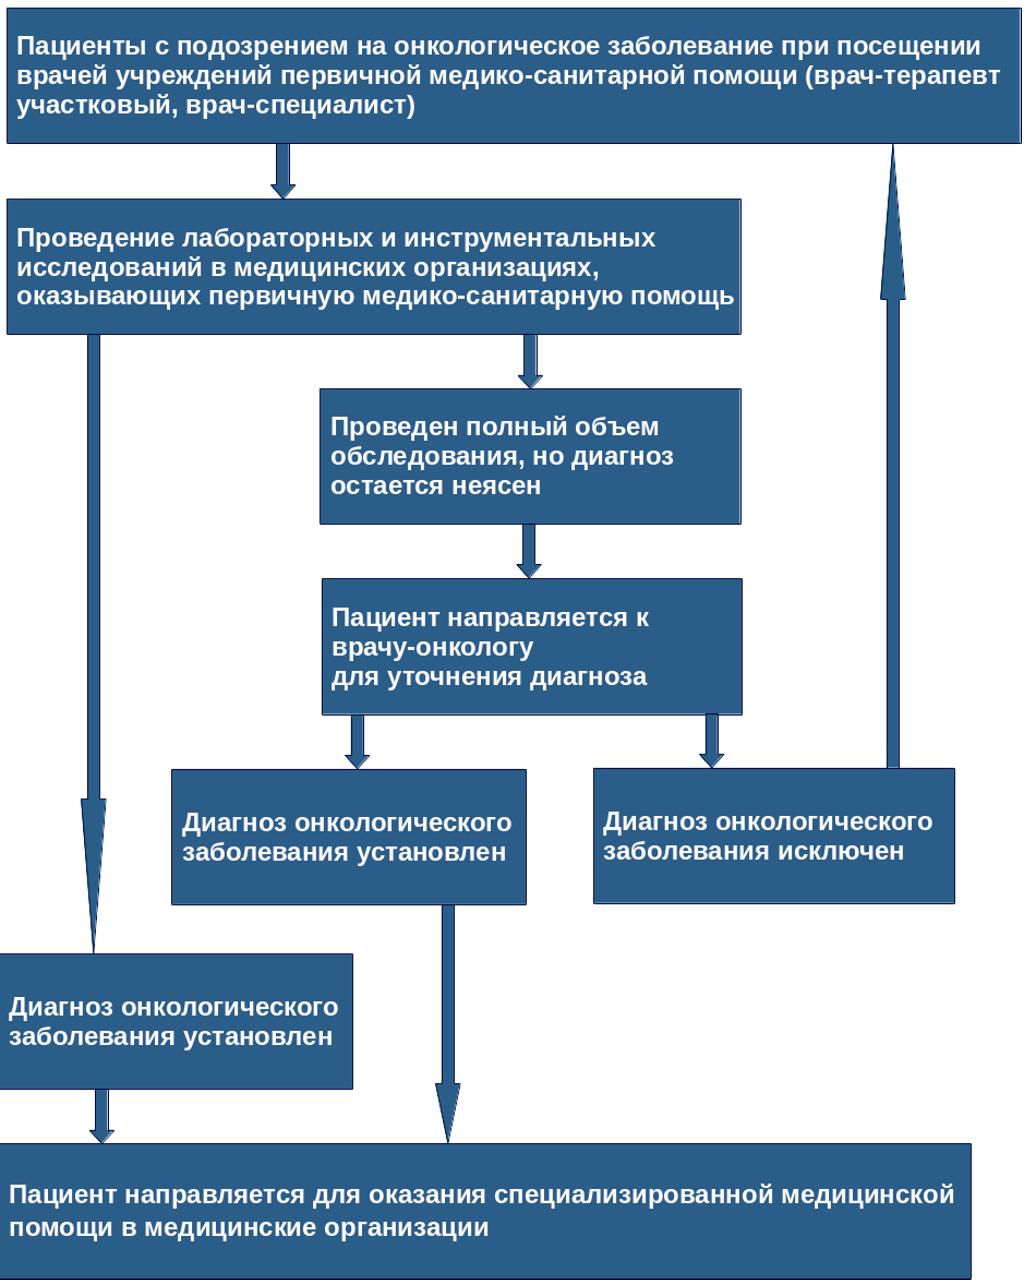 план маршрутизации пациентов